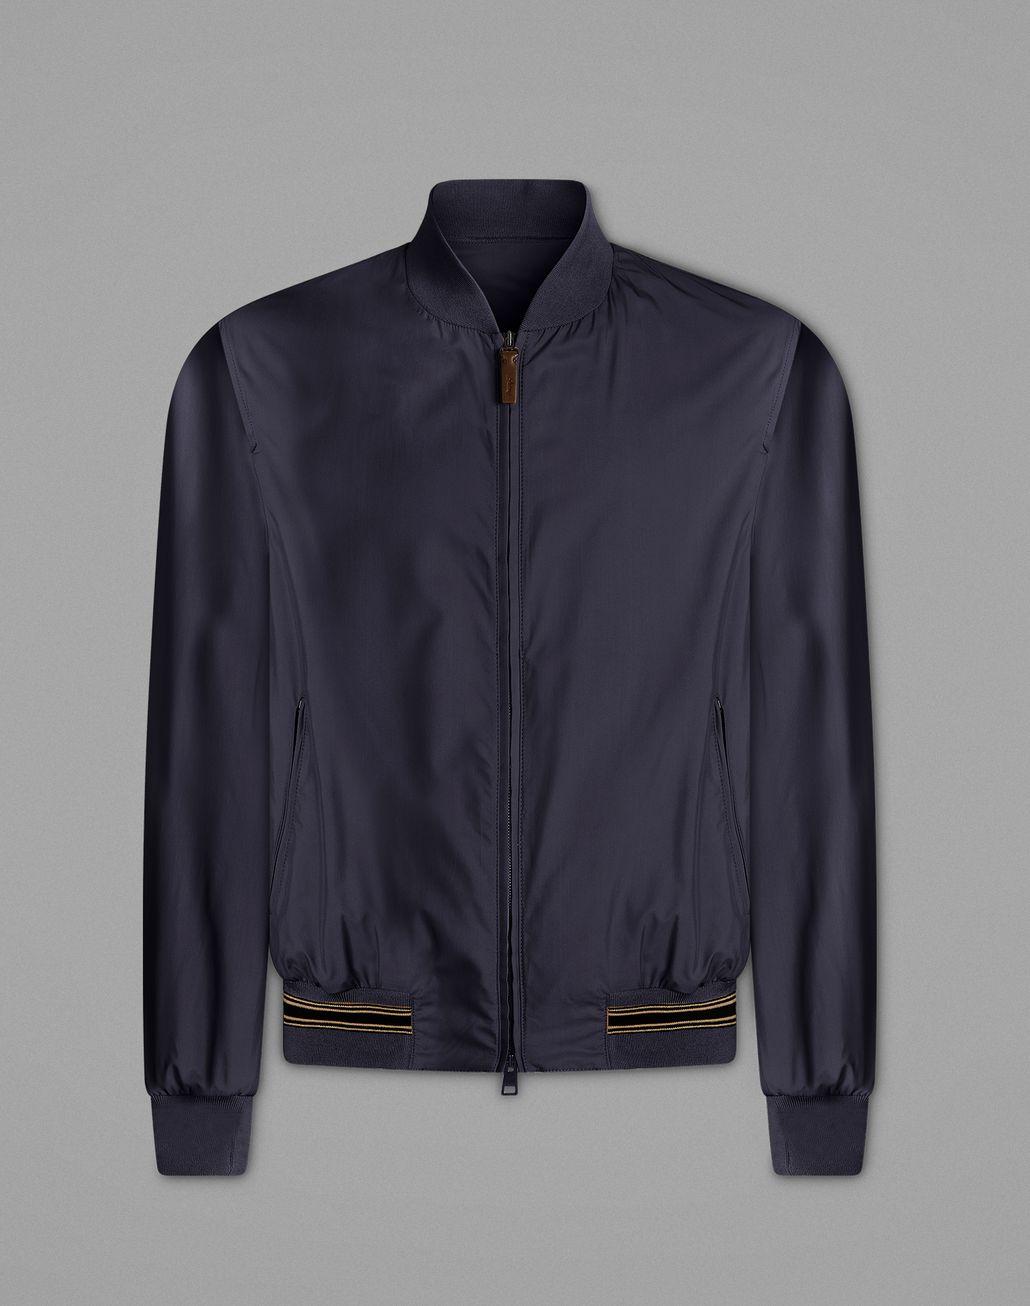 BRIONI Тёмно-Синий Бомбер пиджаки Для Мужчин f